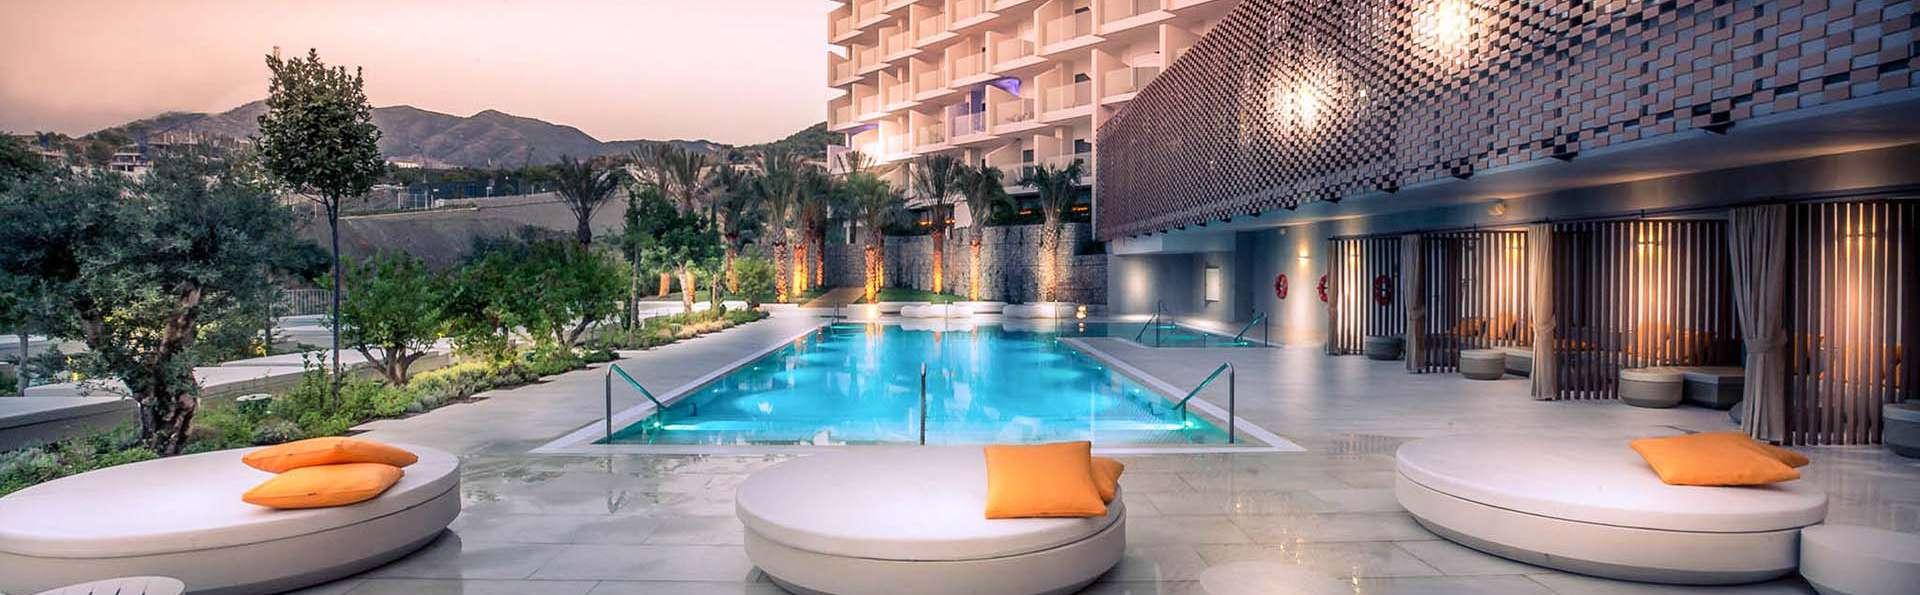 Higuerón hotel Málaga, Curio Collection by HILTON  - EDIT_MED_NOCHE_01.jpg